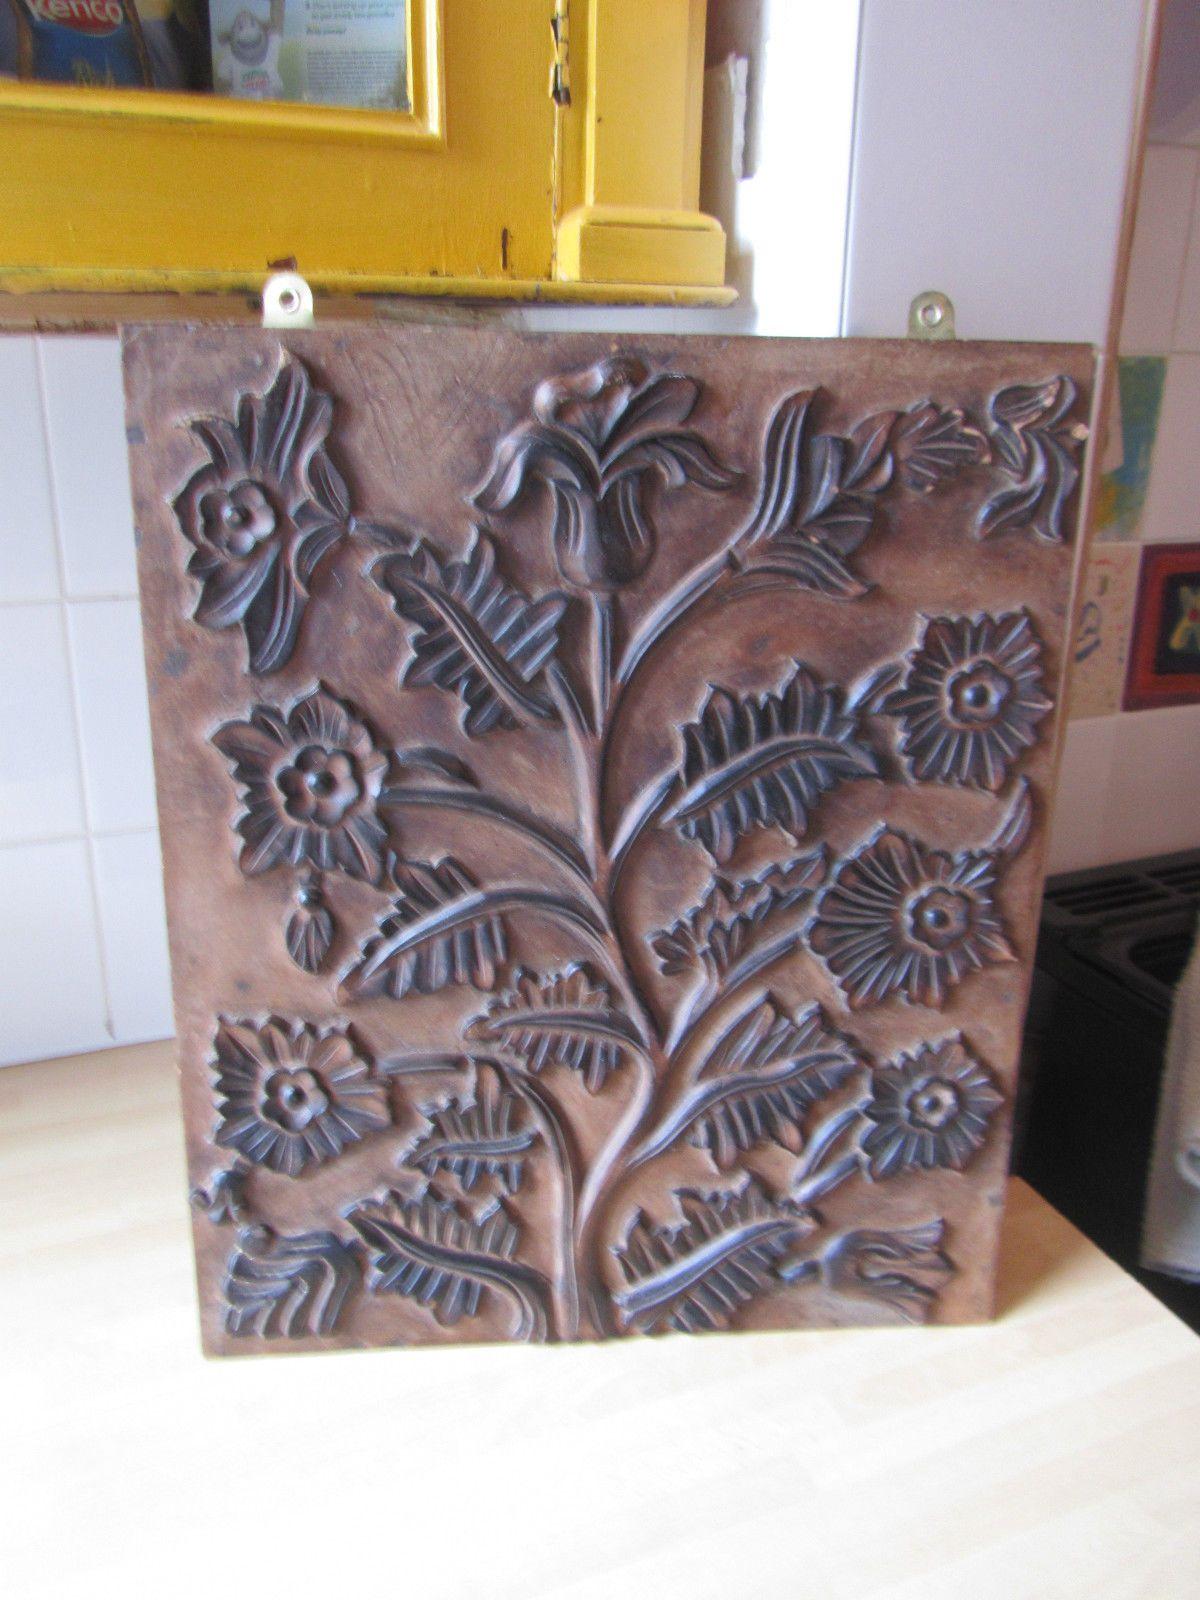 Wooden Floral Plaque Panel Sign Art Nouveau Style Printing Block Feature item | eBay